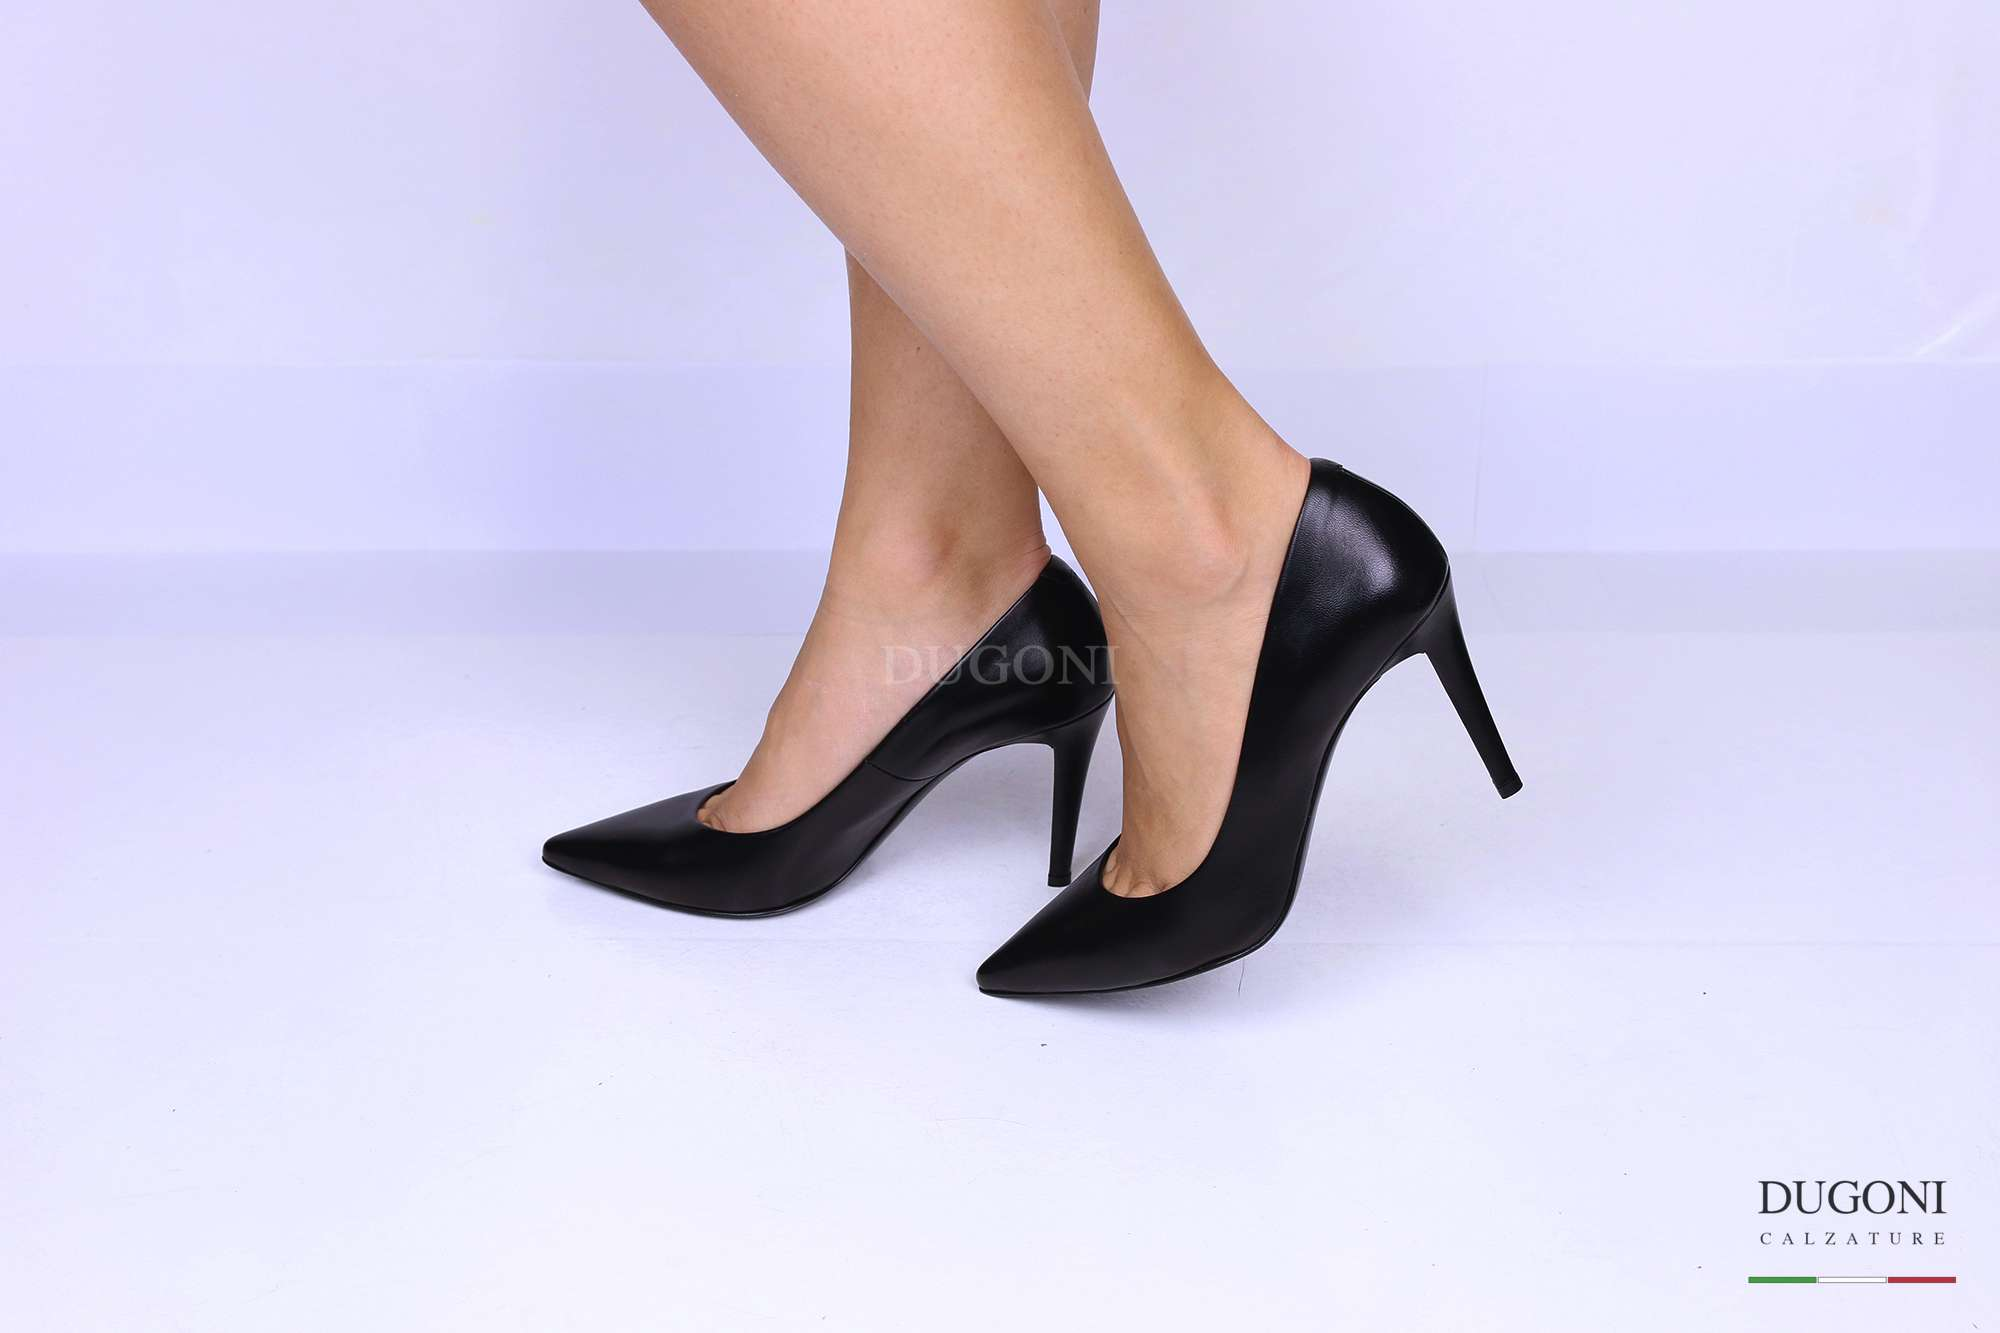 Décolleté sfilato nero </br> D1210 Scarpe donna